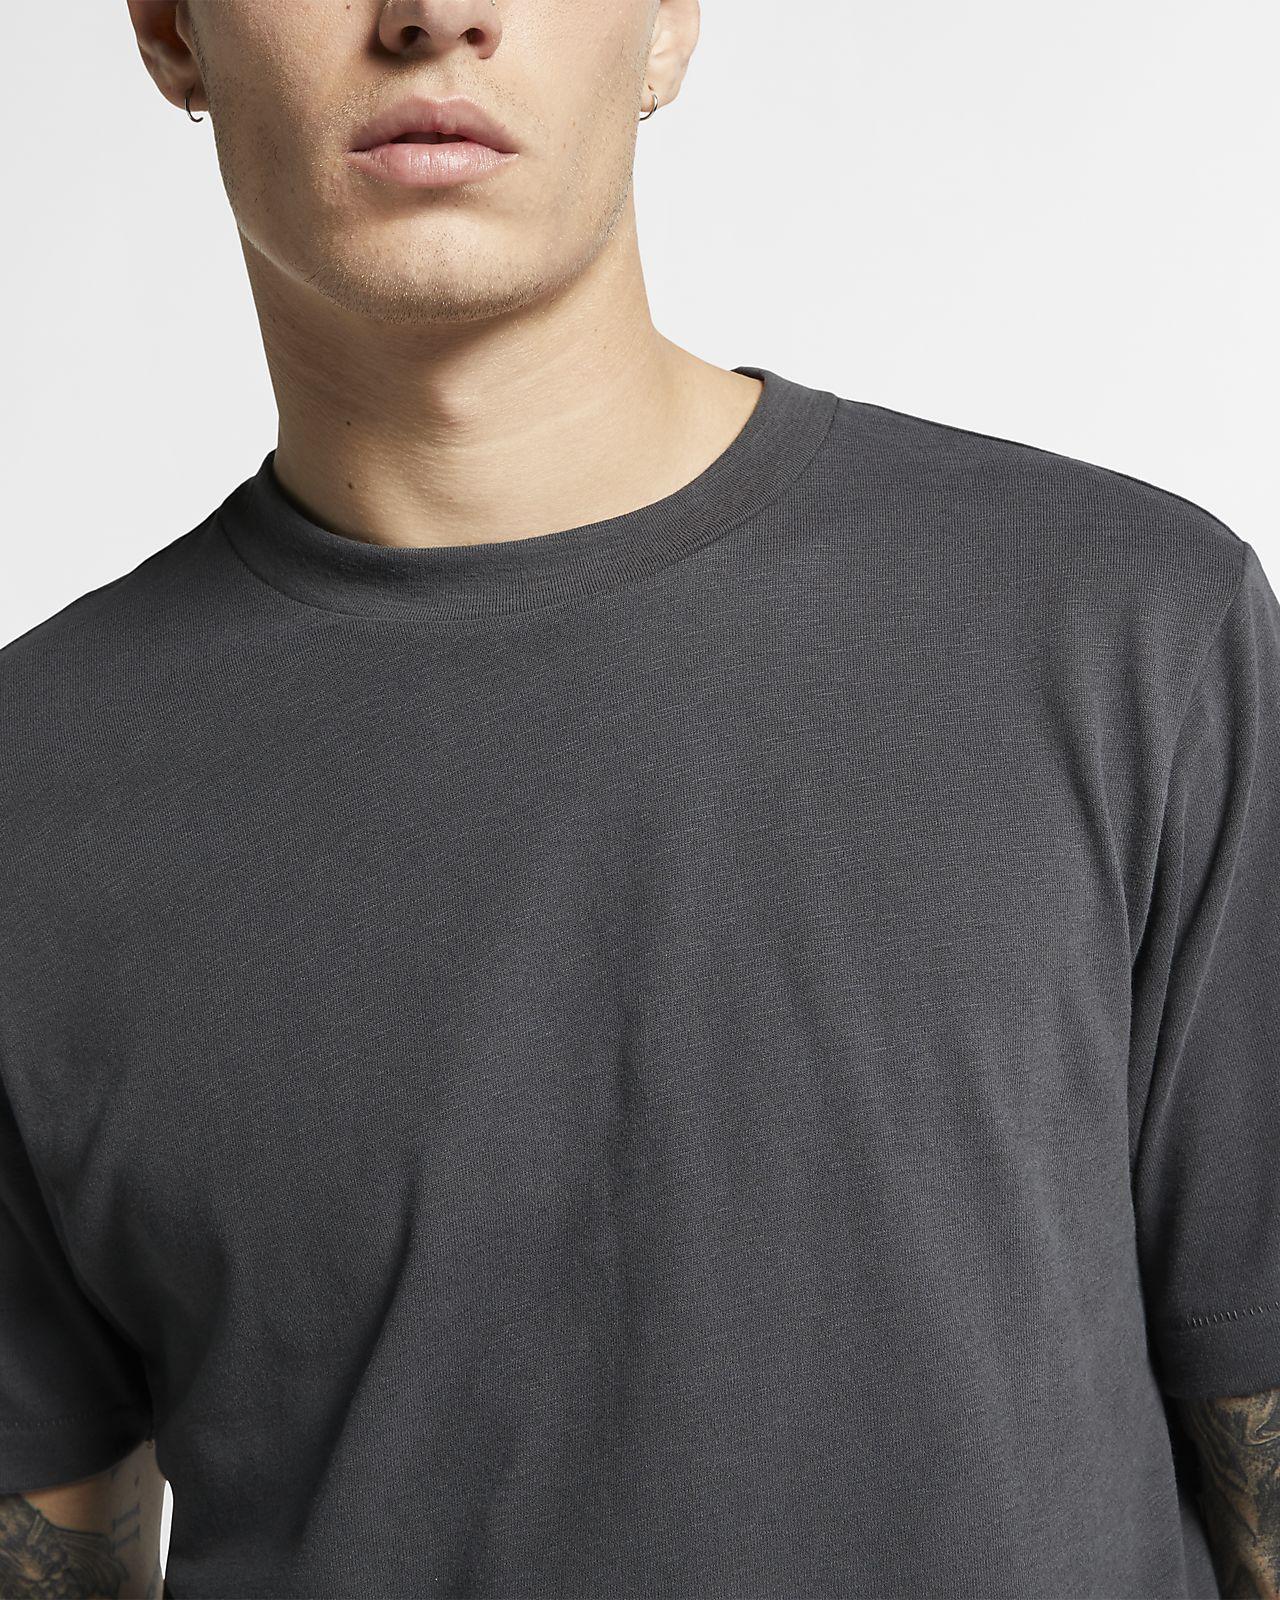 b07b523a Hurley Dri-FIT Savage Men's Short-Sleeve Shirt. Nike.com